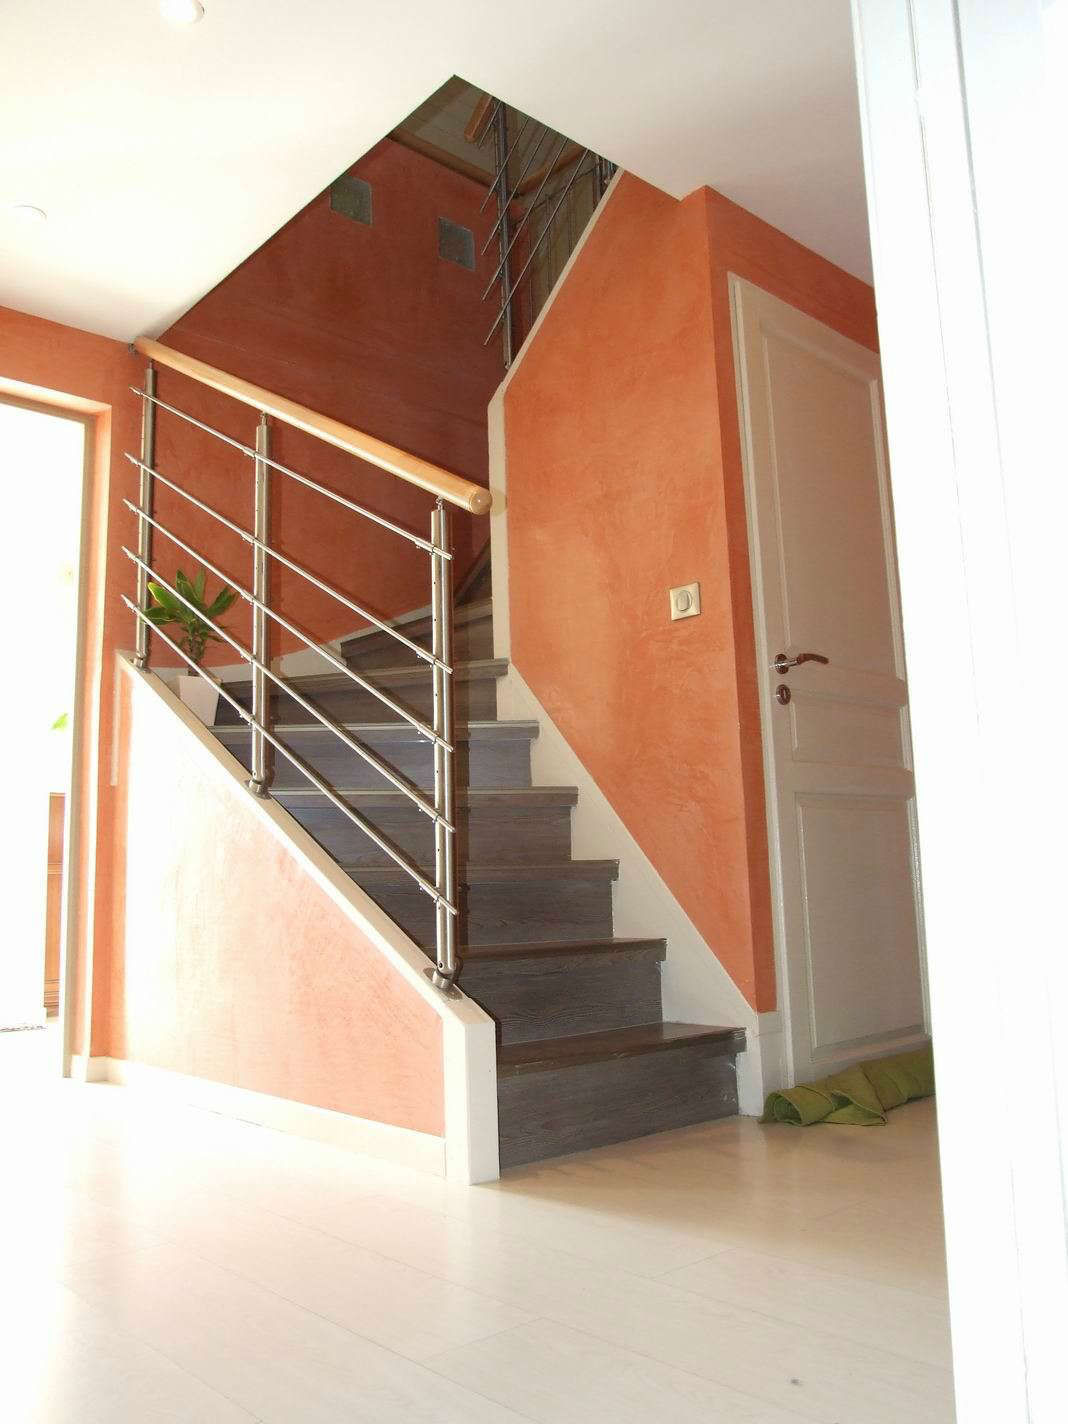 Habillage escalier troyes maytop iso 10 vernis bois for Habillage fenetre pvc renovation